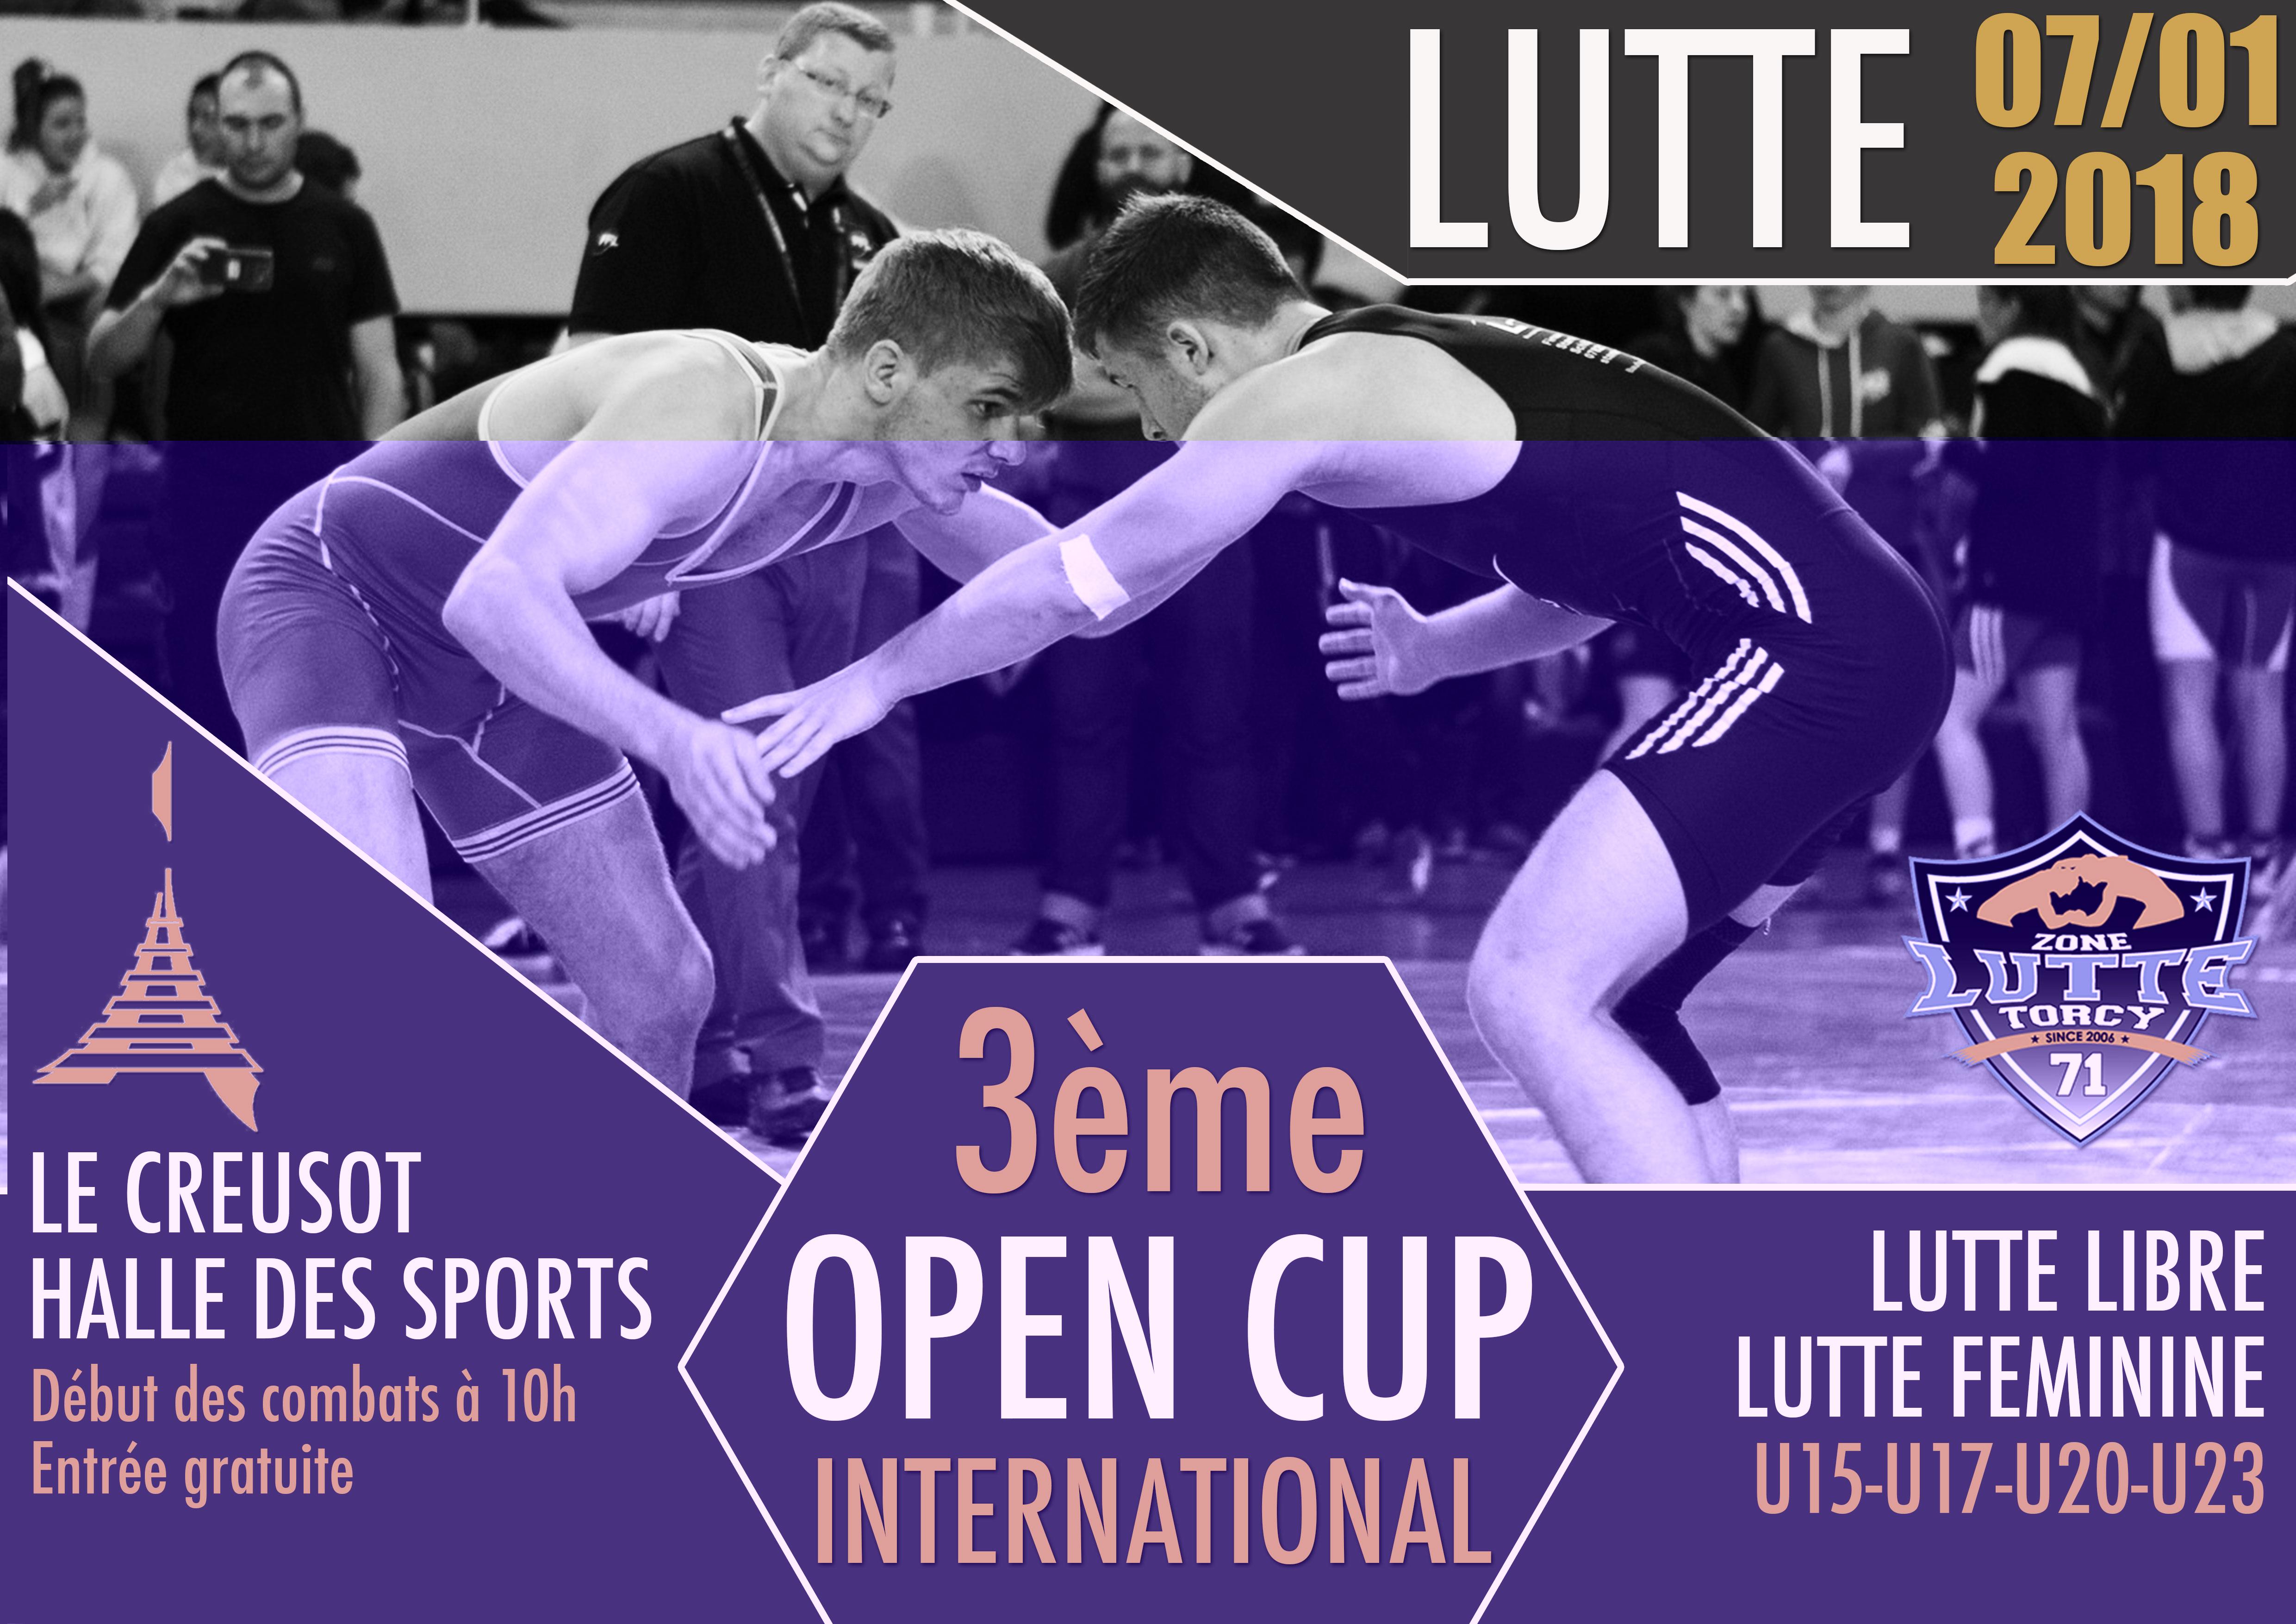 Affiche-Open-Cup-2018